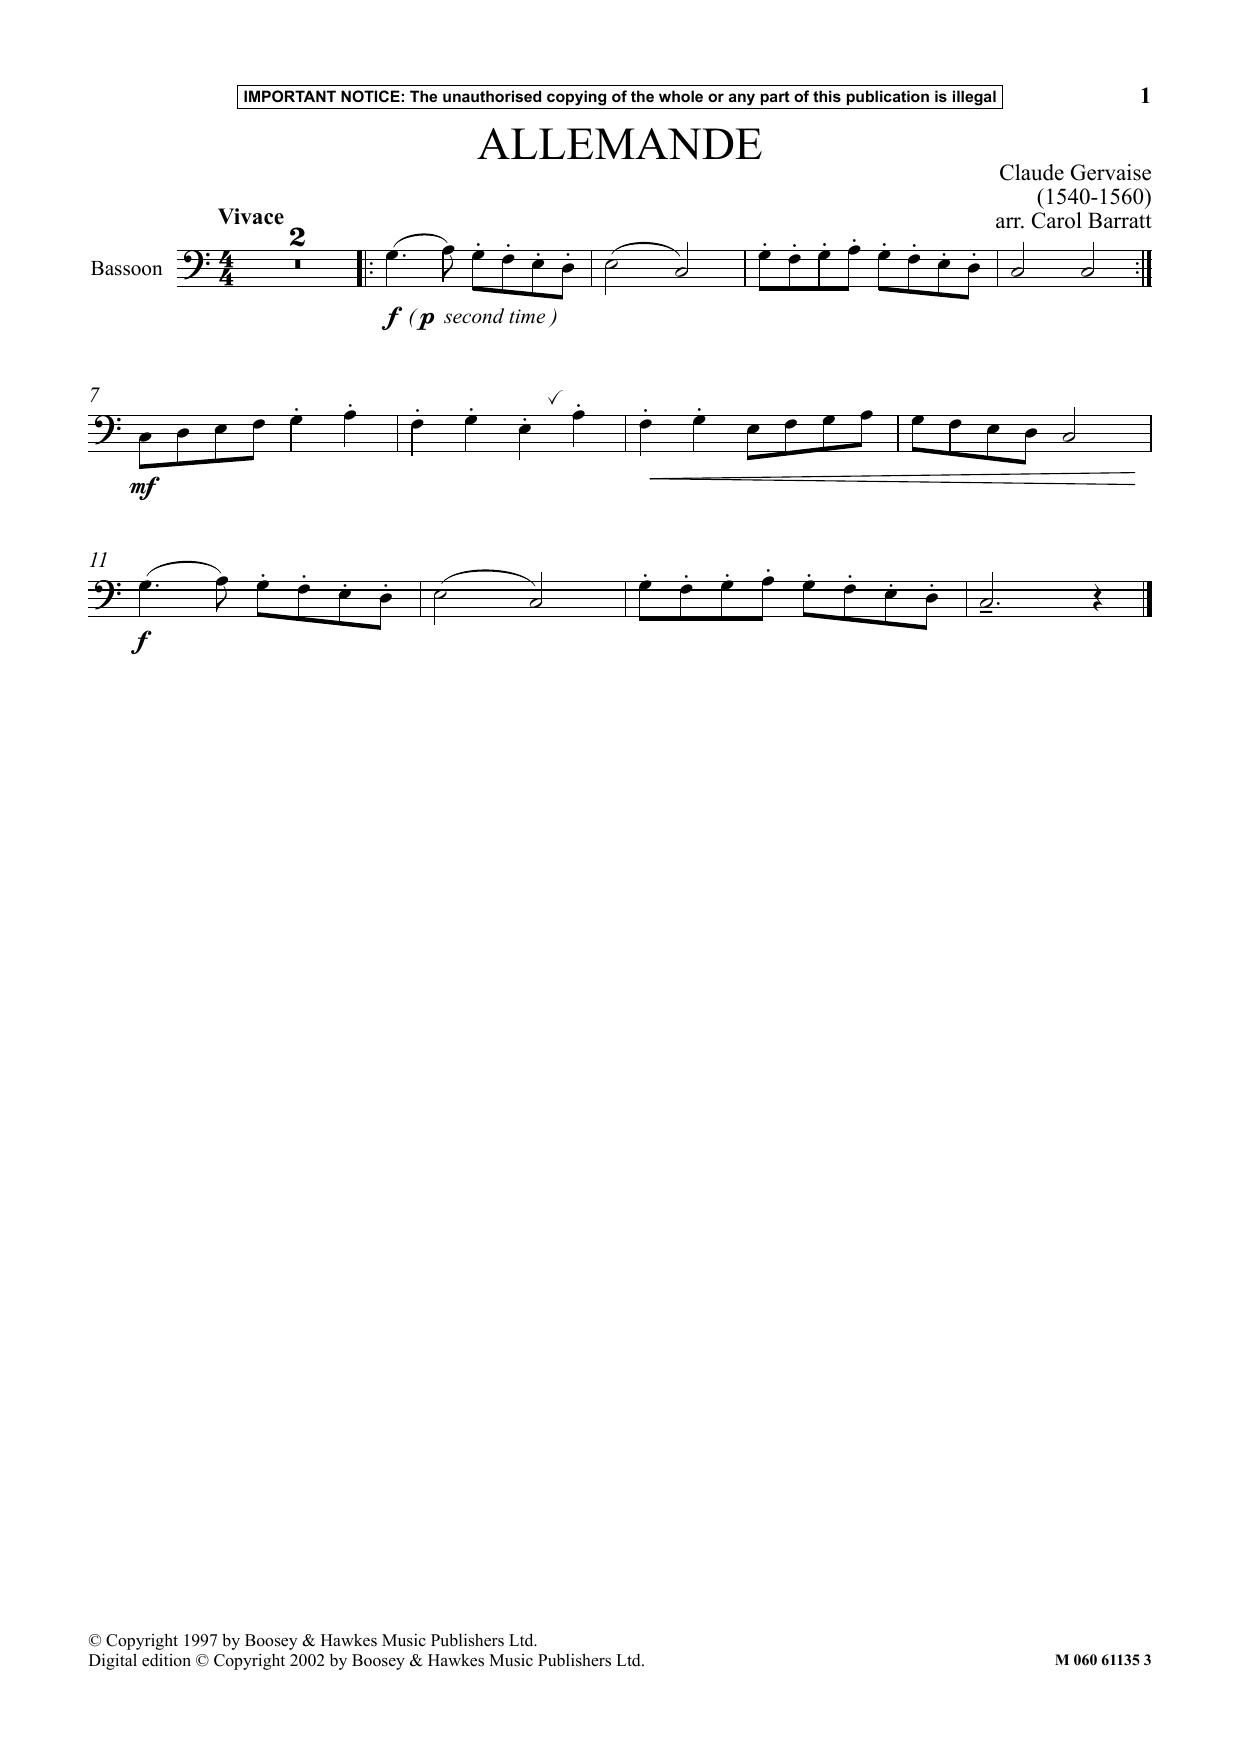 Allemande Sheet Music